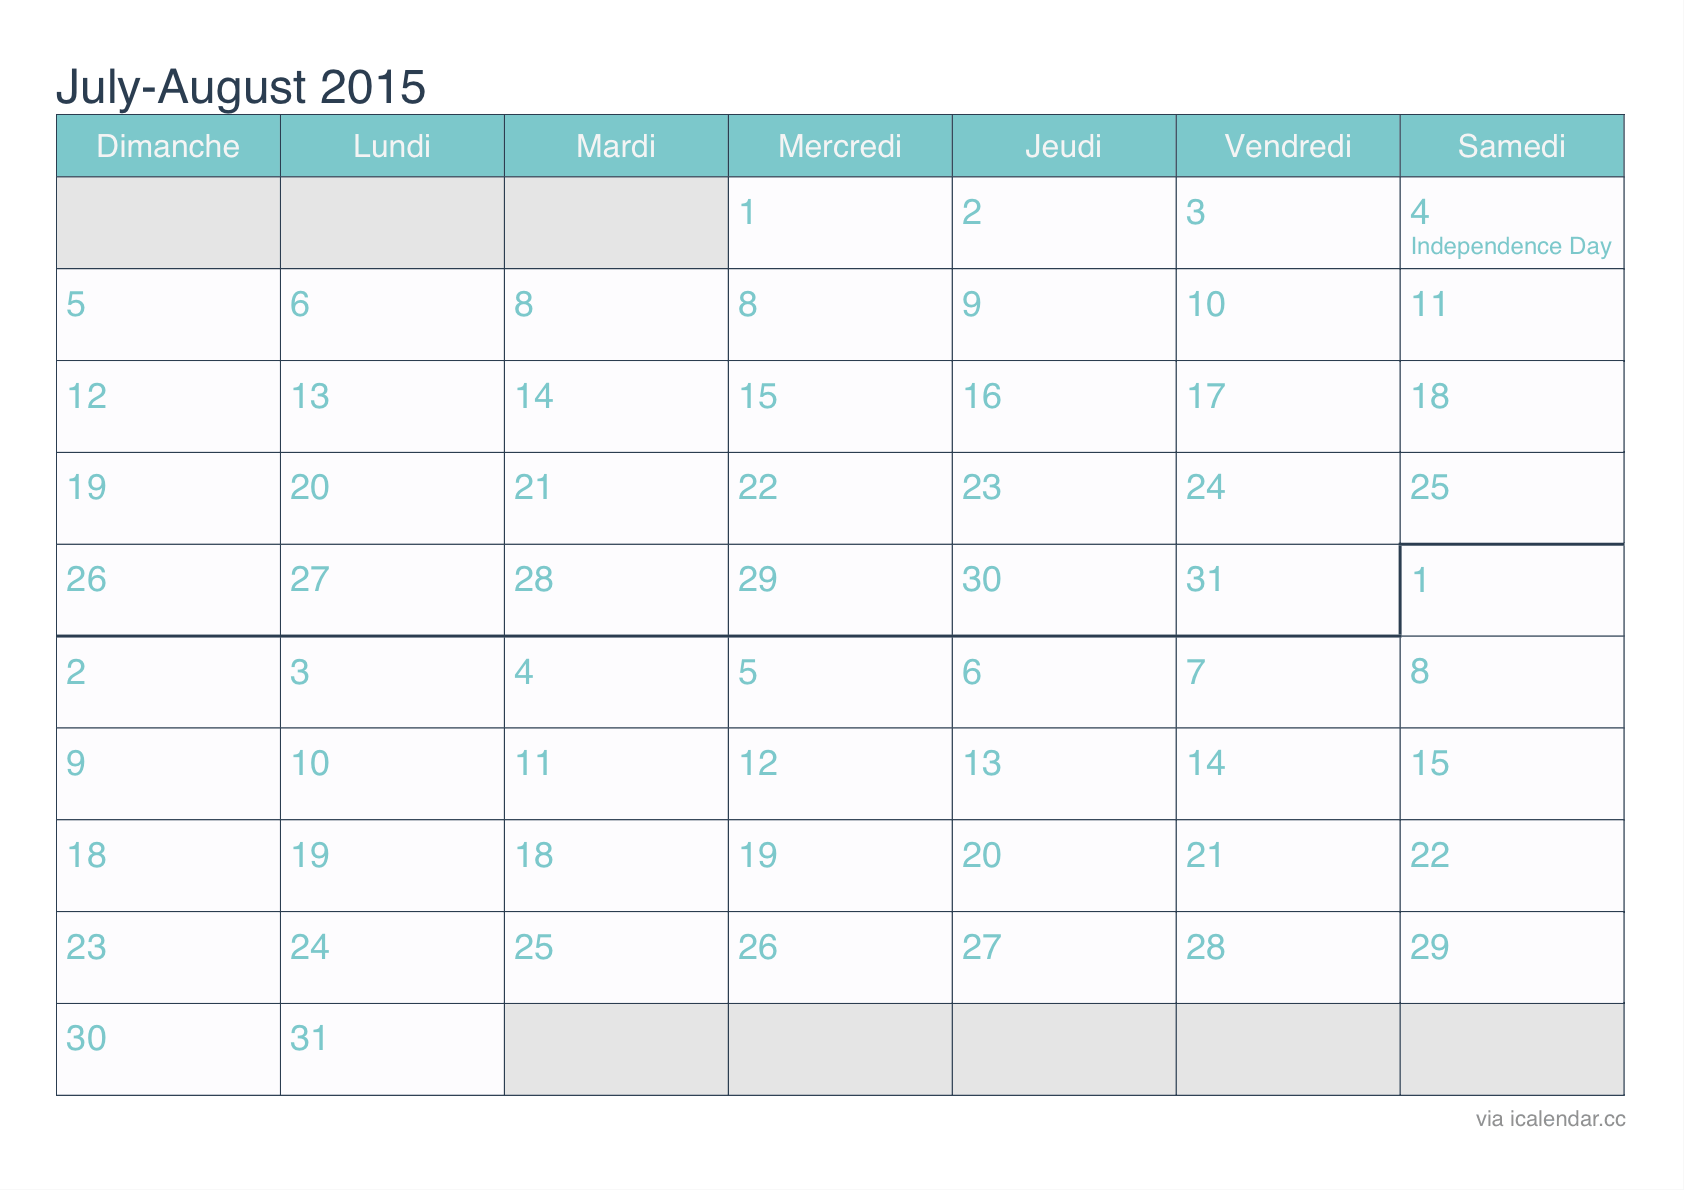 July 2015 Calendar Printable Pdf Template Holidays Images Calendar Printables 2015 Calendar Printable August 2015 Calendar